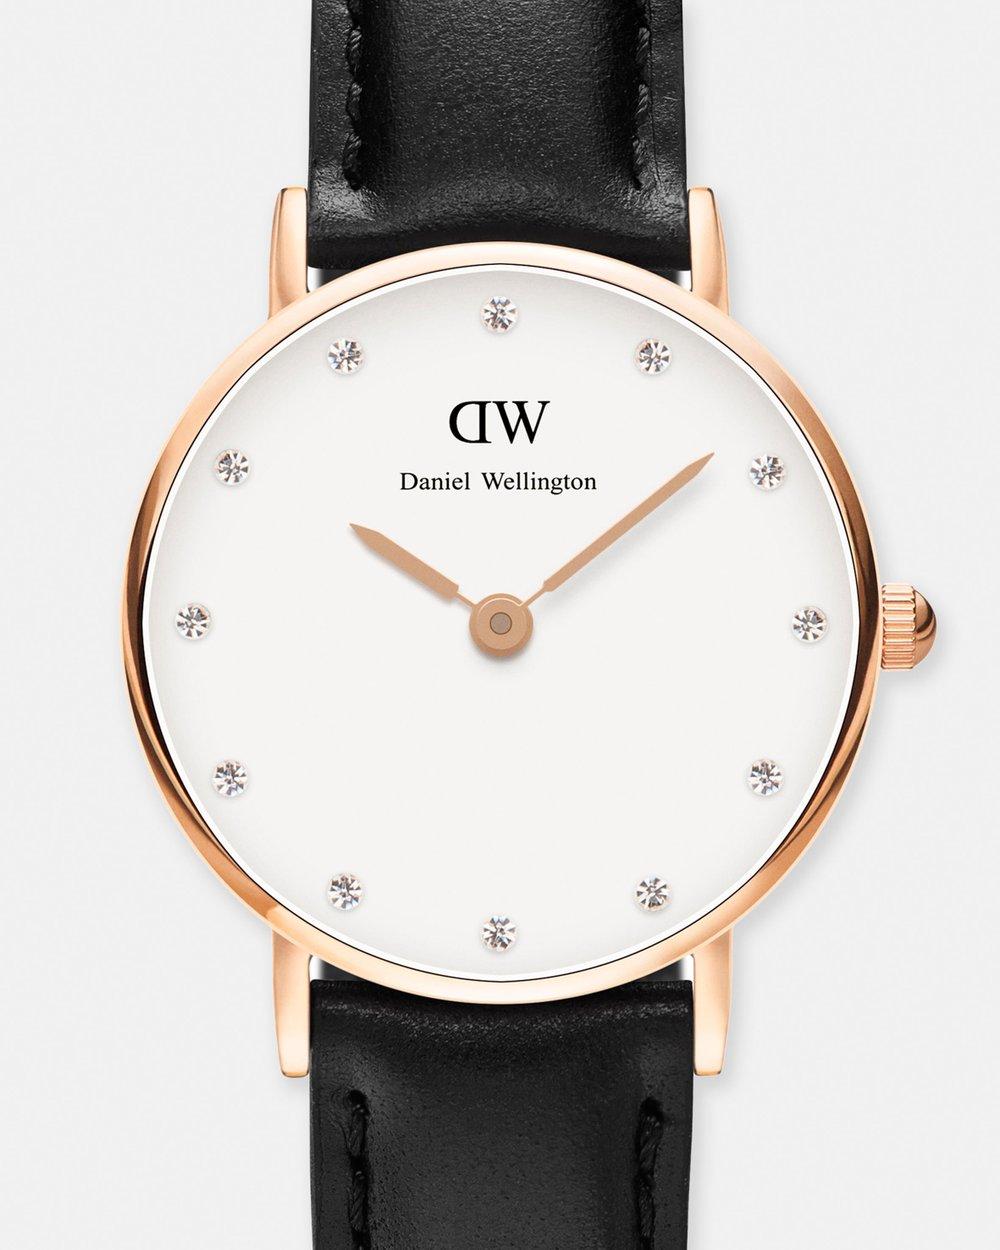 Daniel wellington buy daniel wellington watches online australia daniel wellington buy daniel wellington watches online australia the iconic negle Gallery